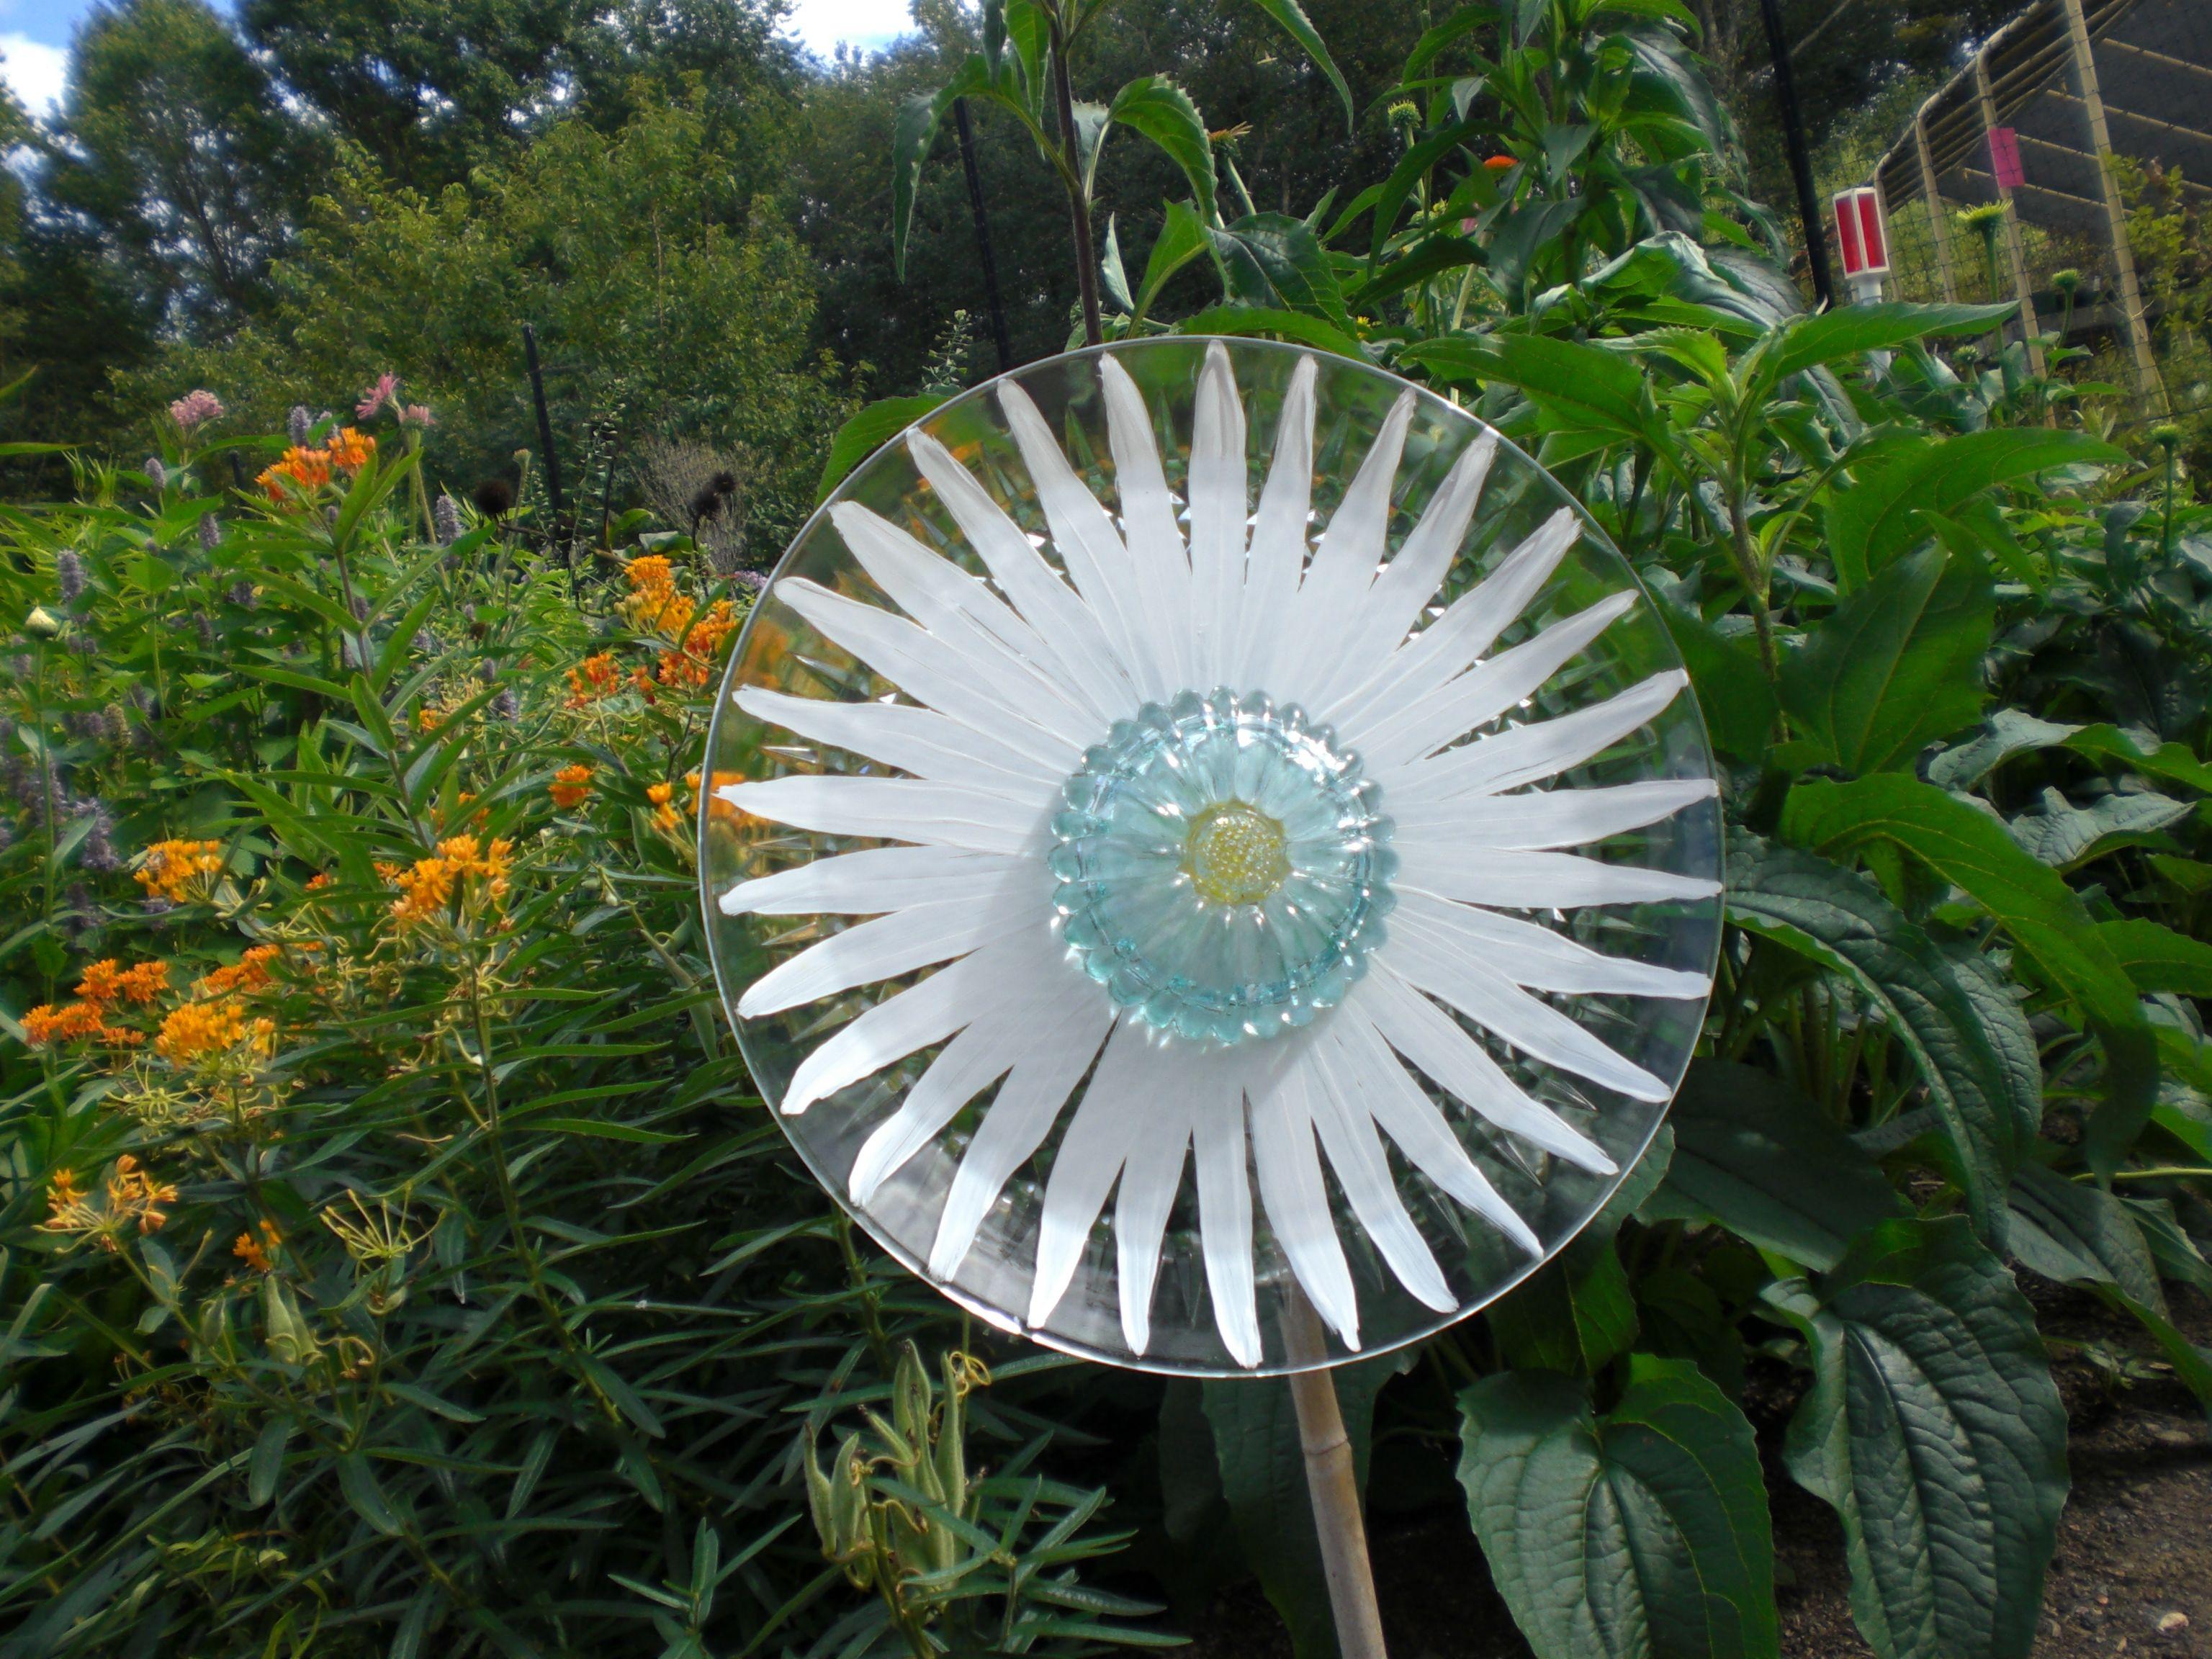 115 white flower with blue center glass garden flower sold glass 115 white flower with blue center glass garden flower sold izmirmasajfo